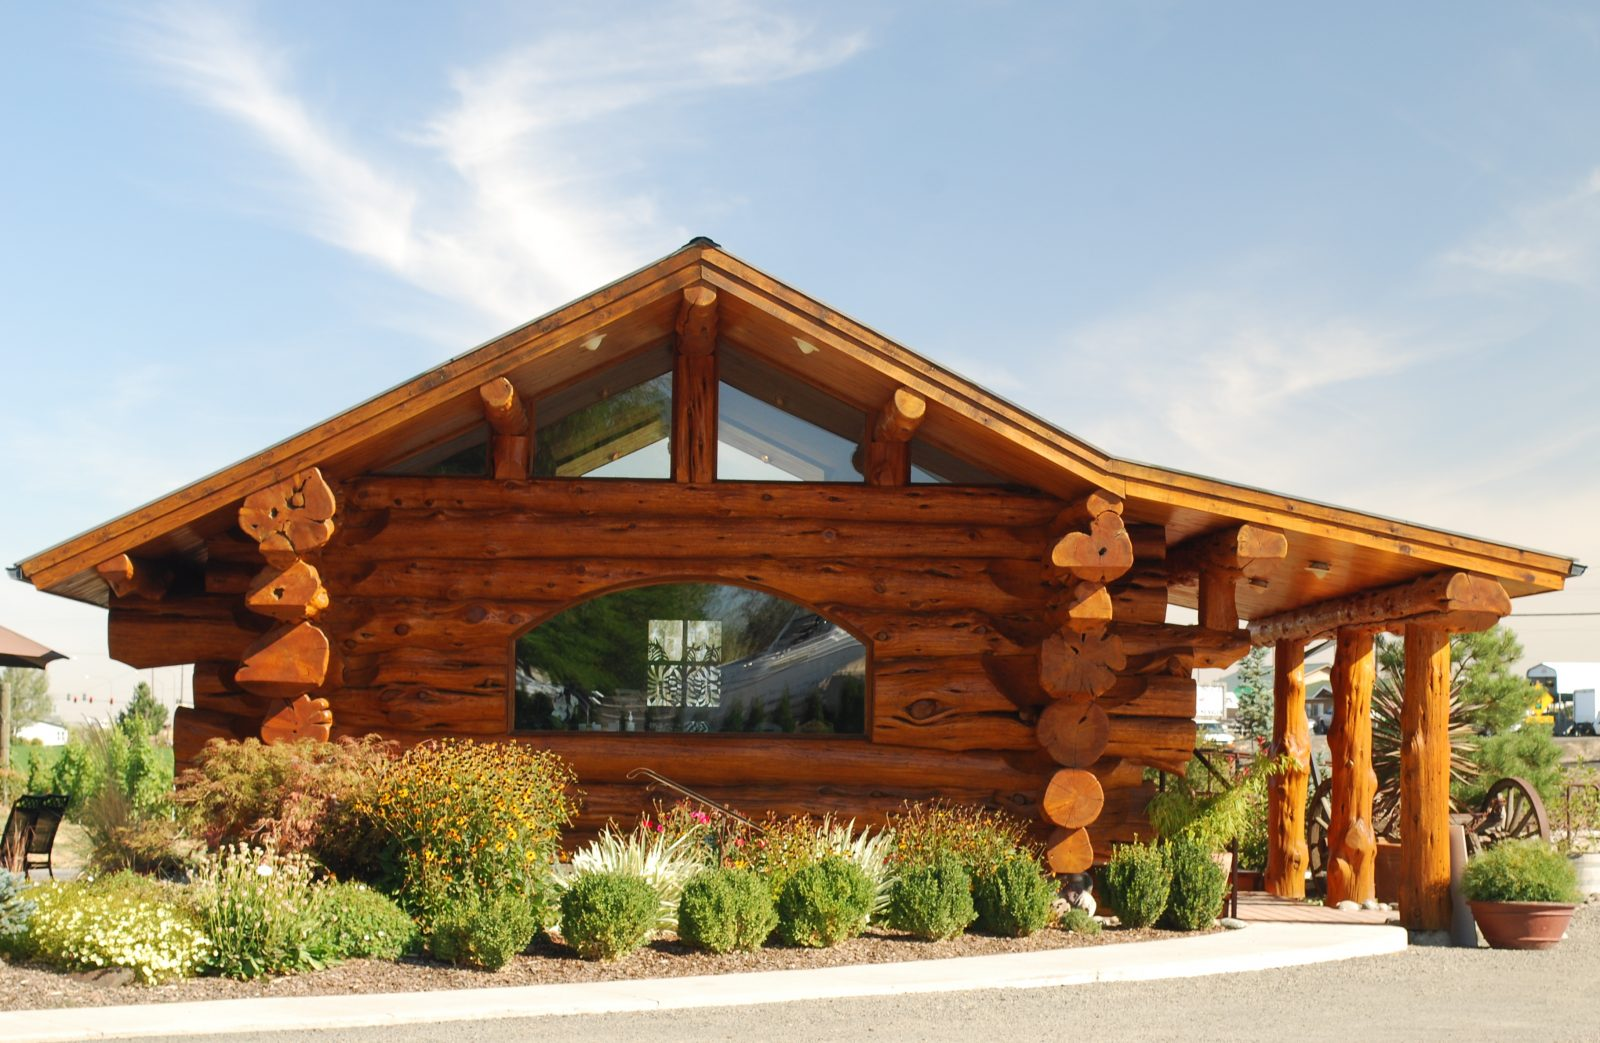 Zerba Cellars winery near the Lodge of Columbia Point in Richland, Washington